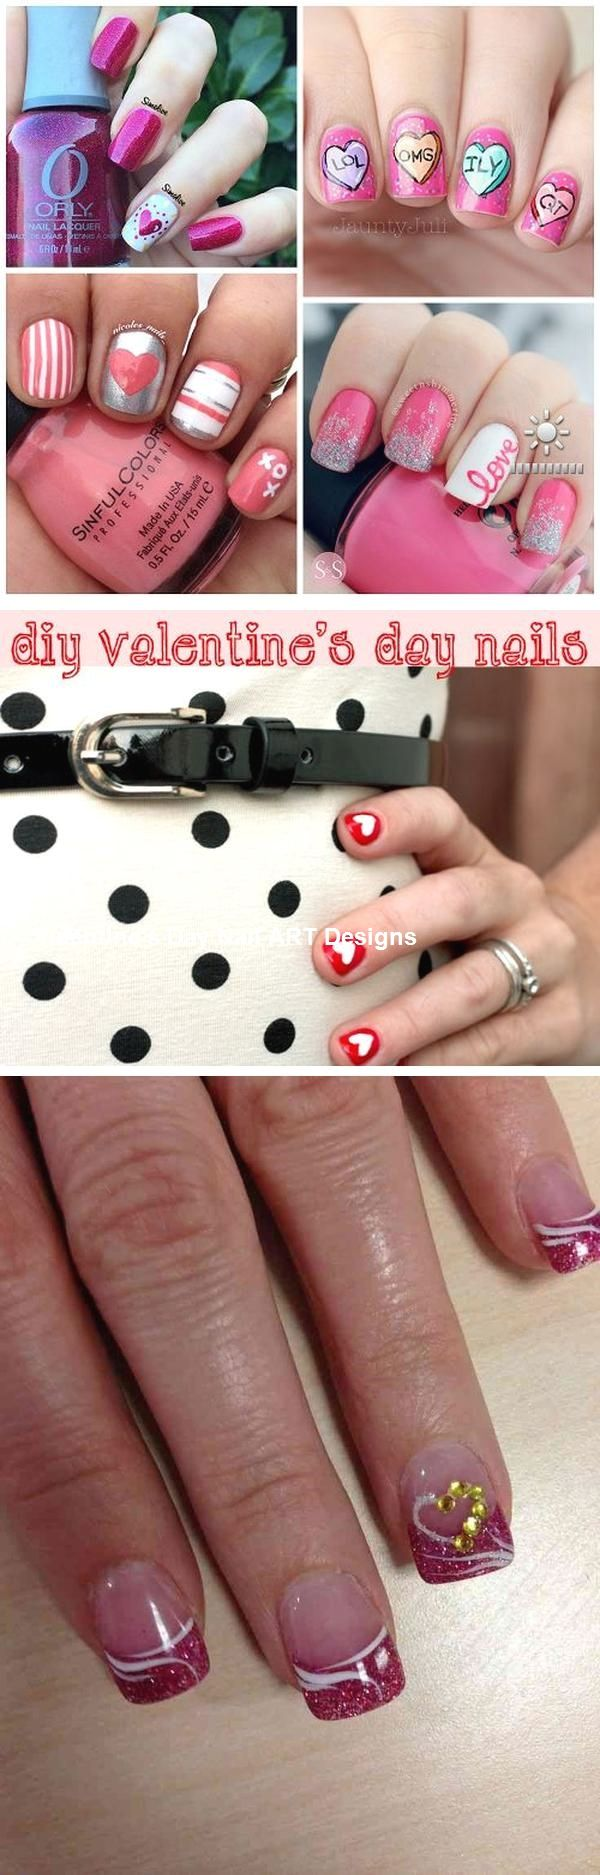 Best Nail Art Design Ideas for Valentines Day #valentinesday